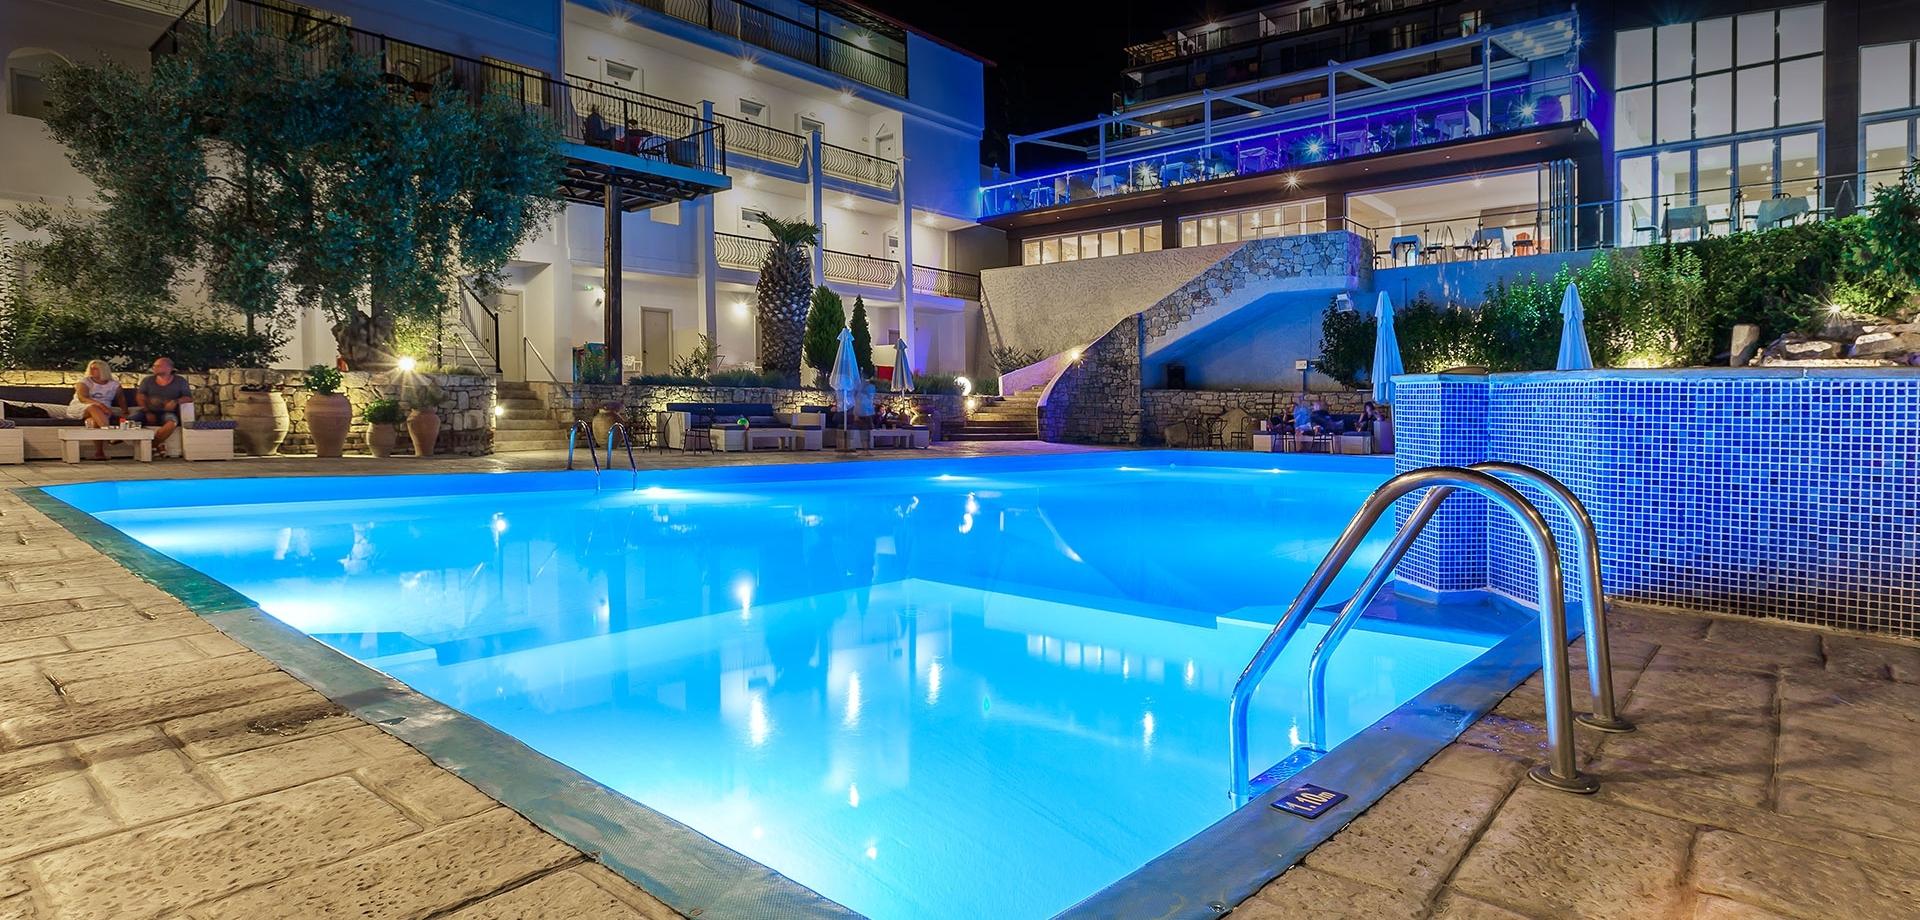 4* Kriopigi Hotel - Κασσάνδρα Χαλκιδικής ✦ -30% ✦ 3